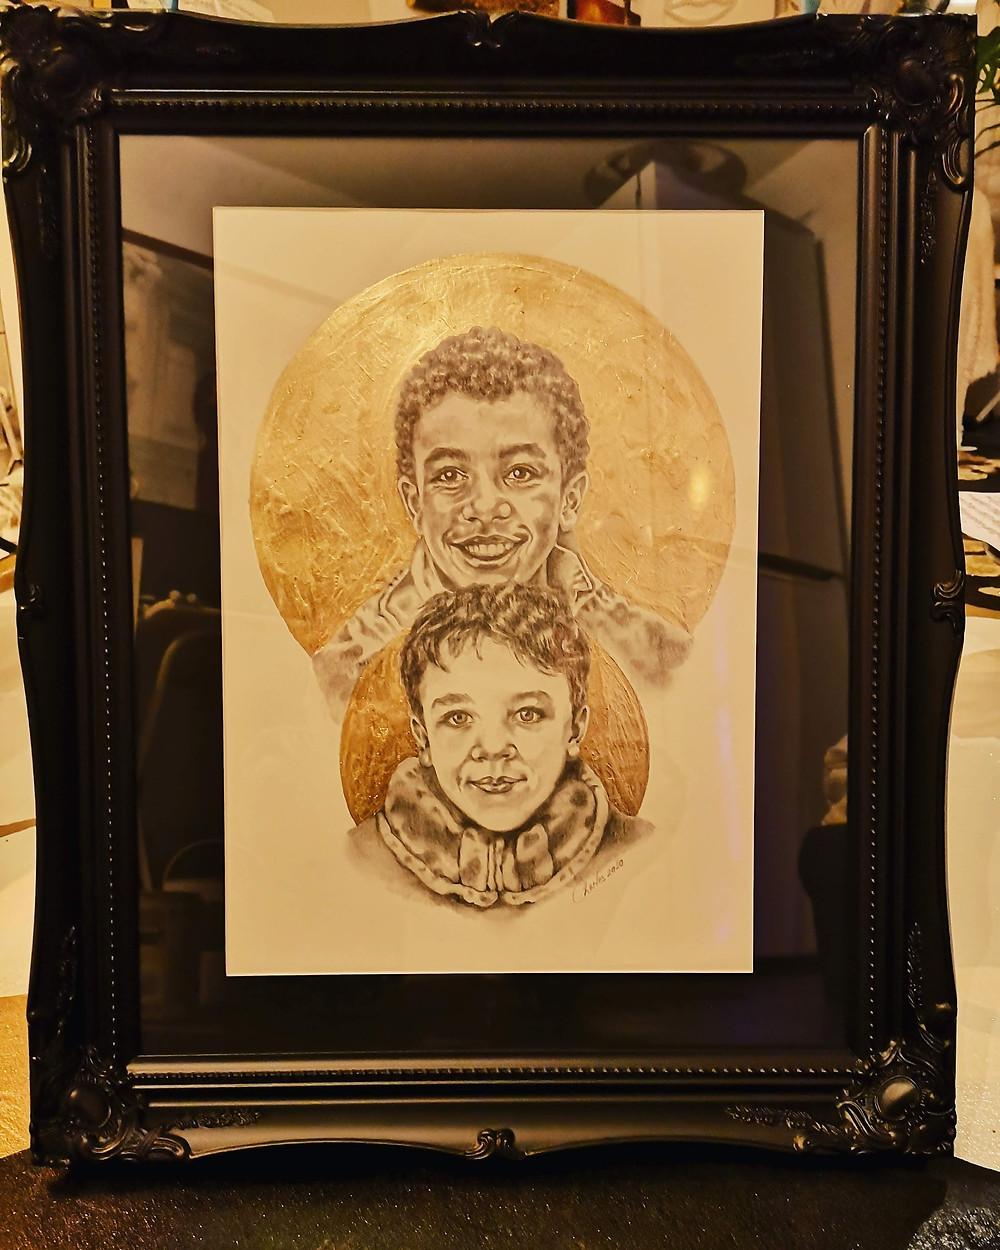 Graphite and 24k gold portrait by portrait artist Charles Frinton